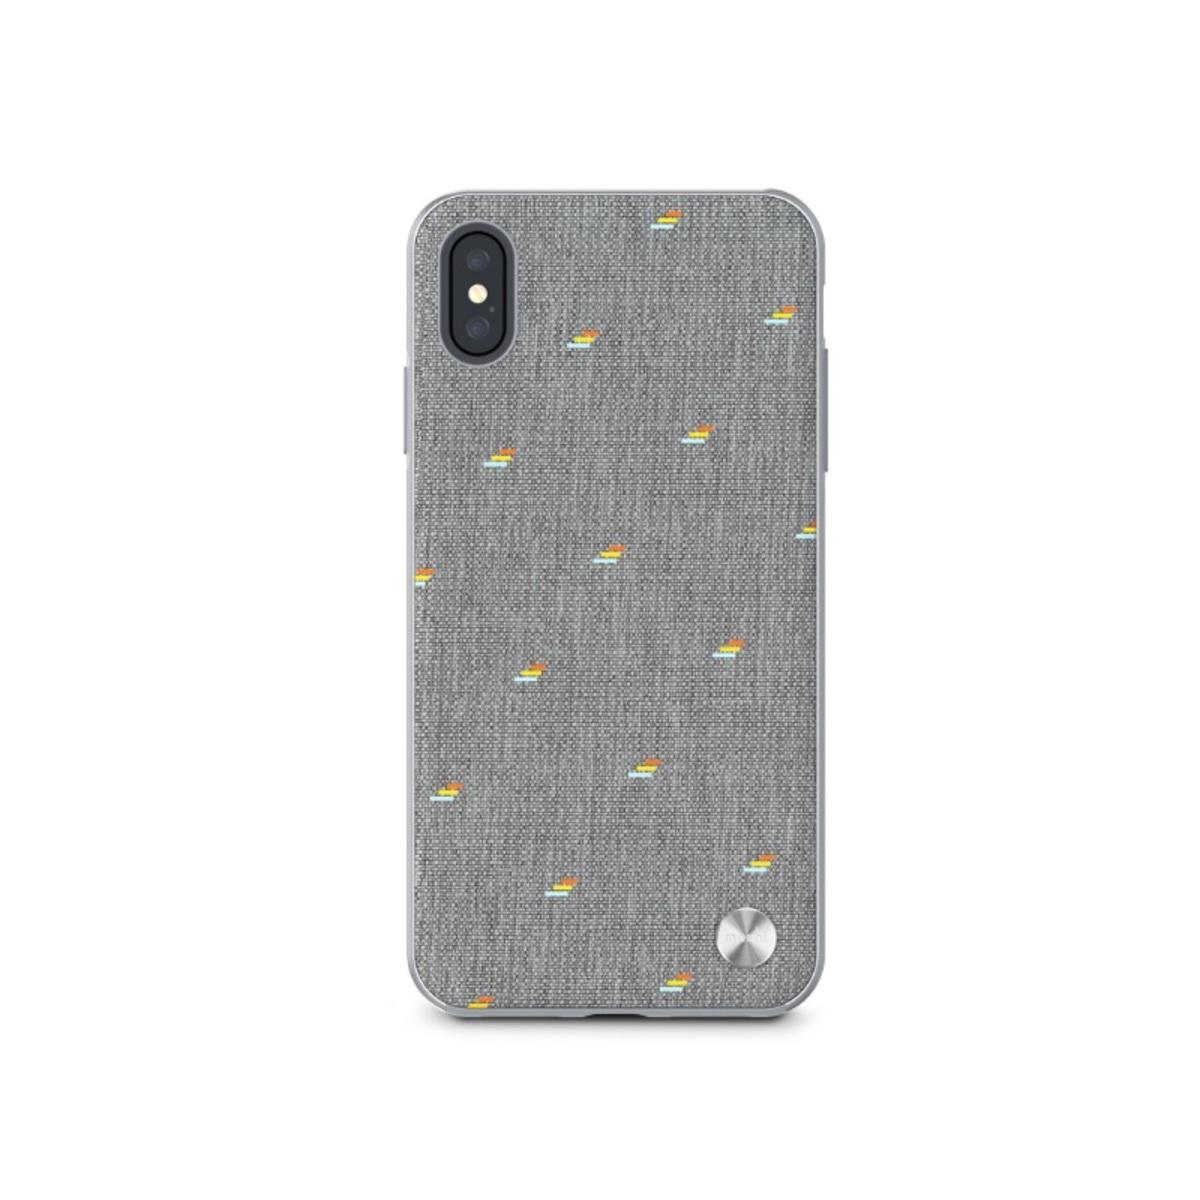 VESTA SLIM HARDSHELL CASE FOR IPHONE XS MAX - GRAY ( 99MO116012 )